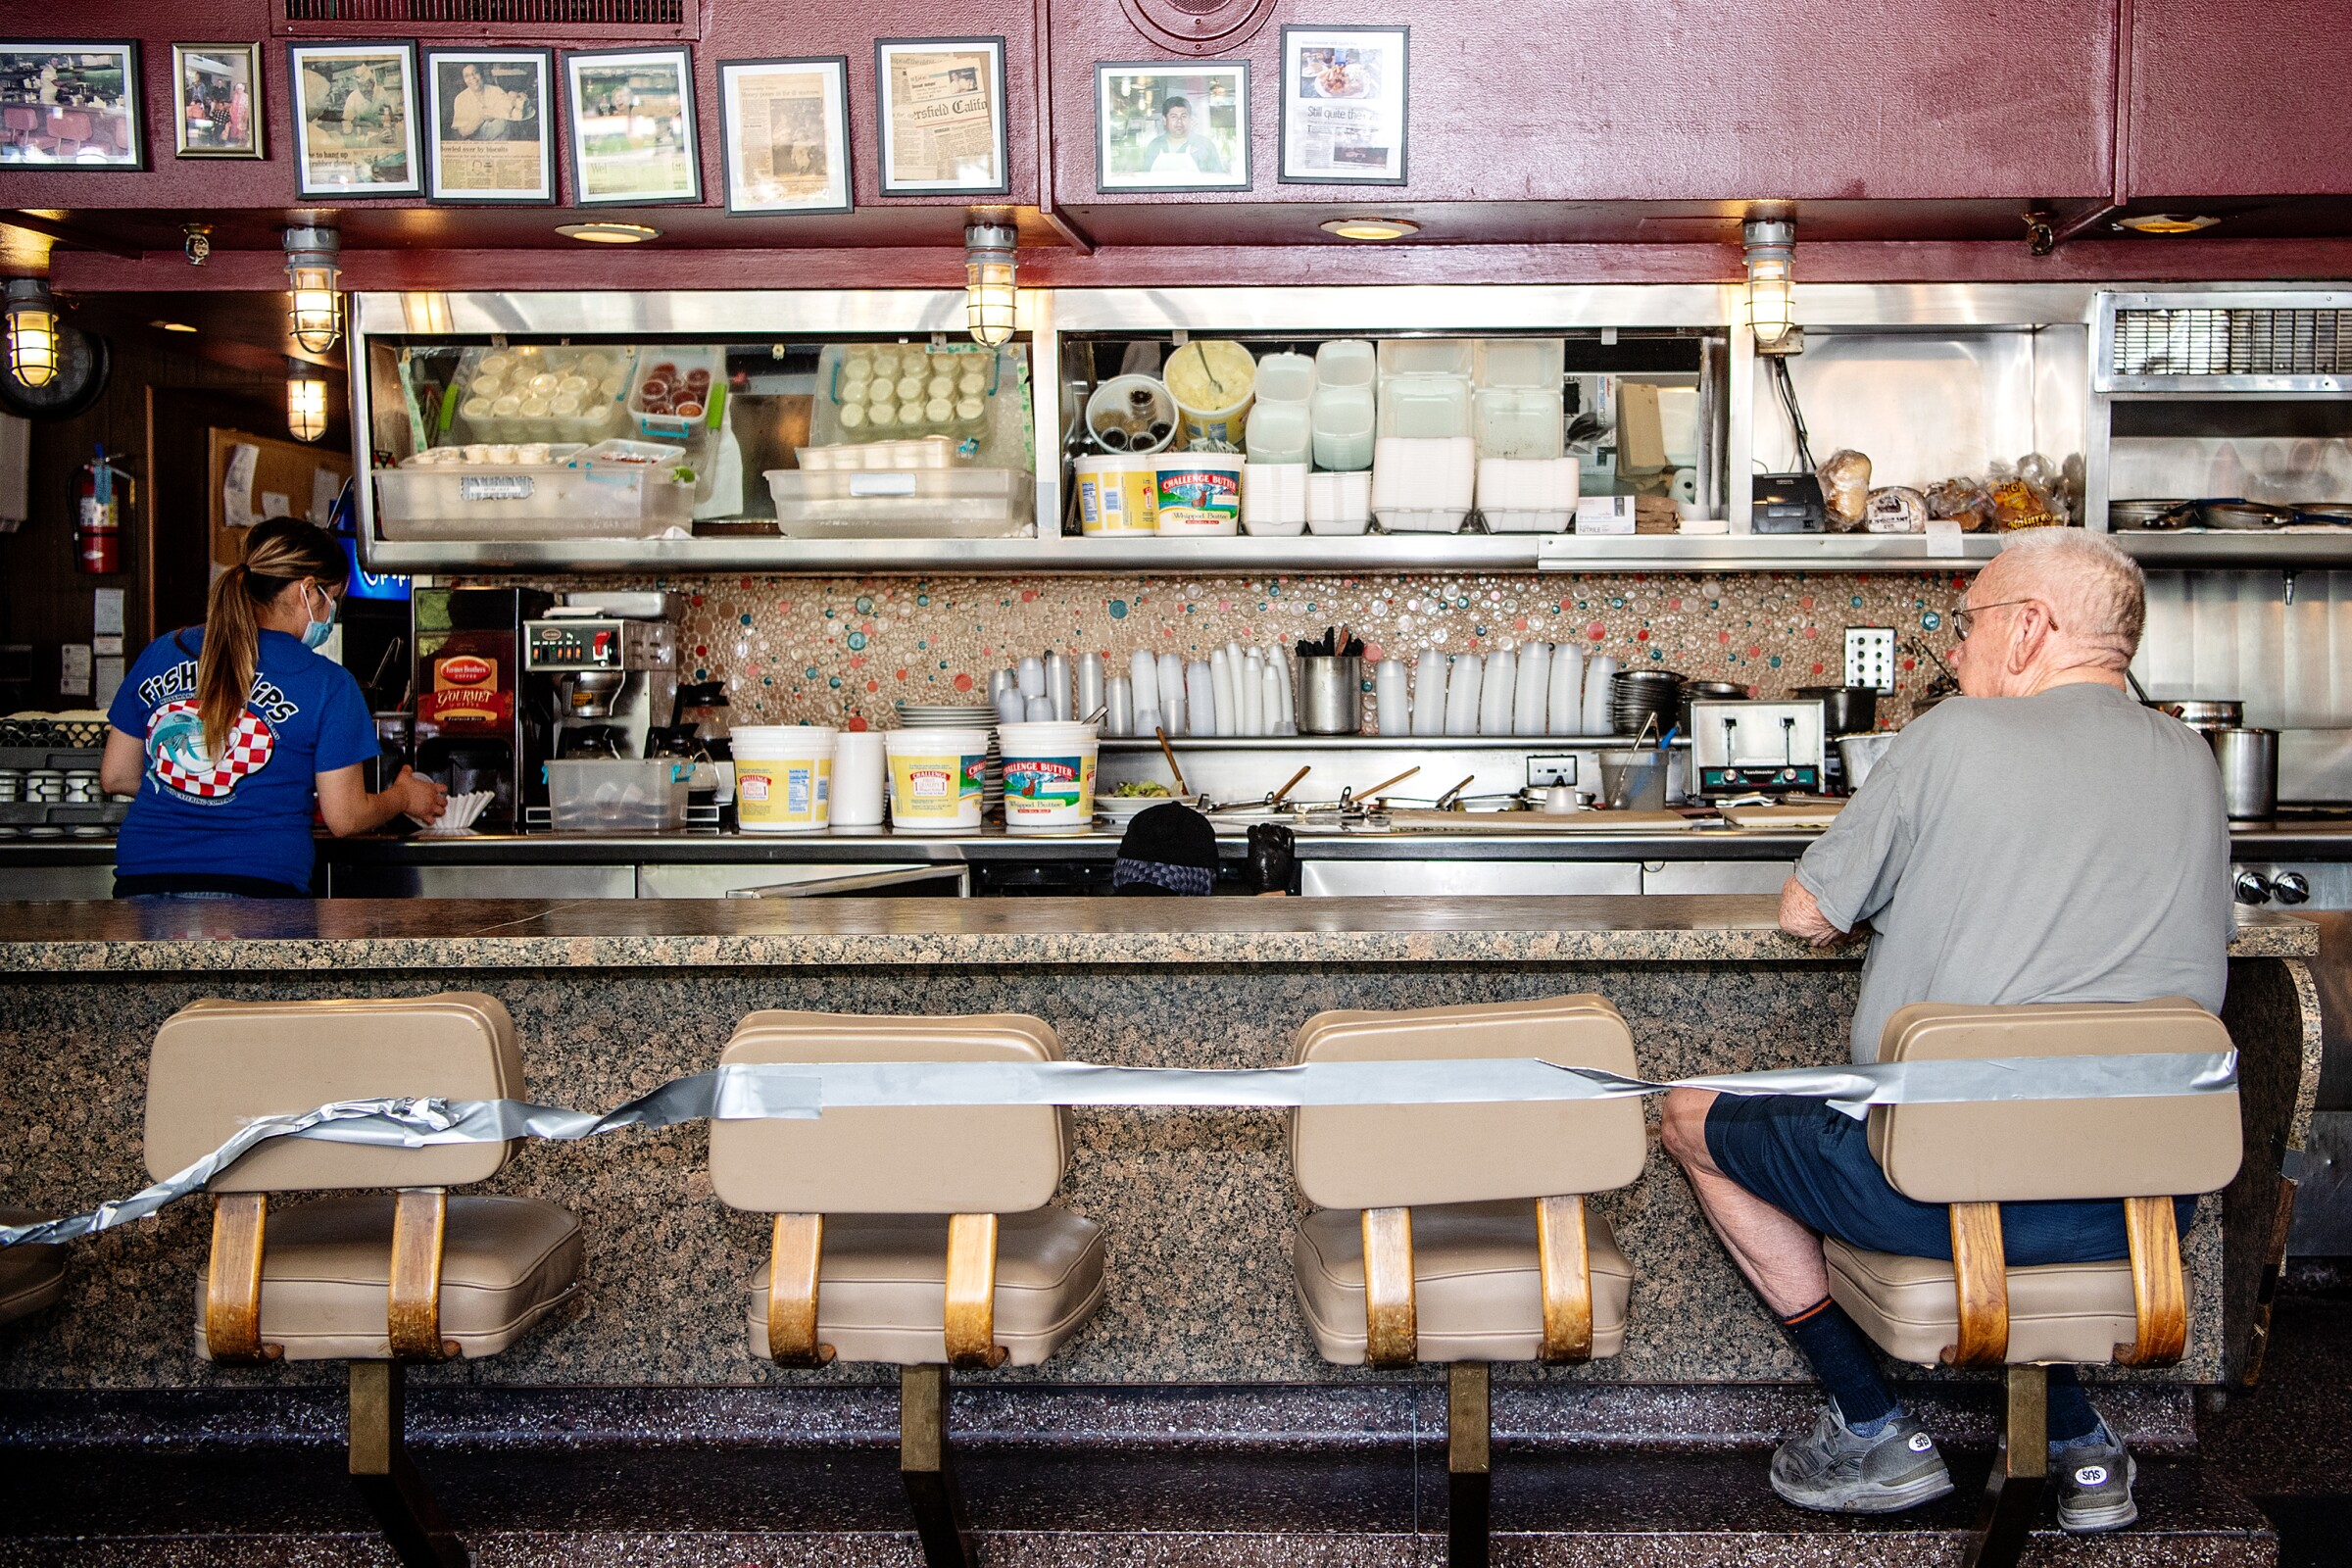 Mossman's coffee shop